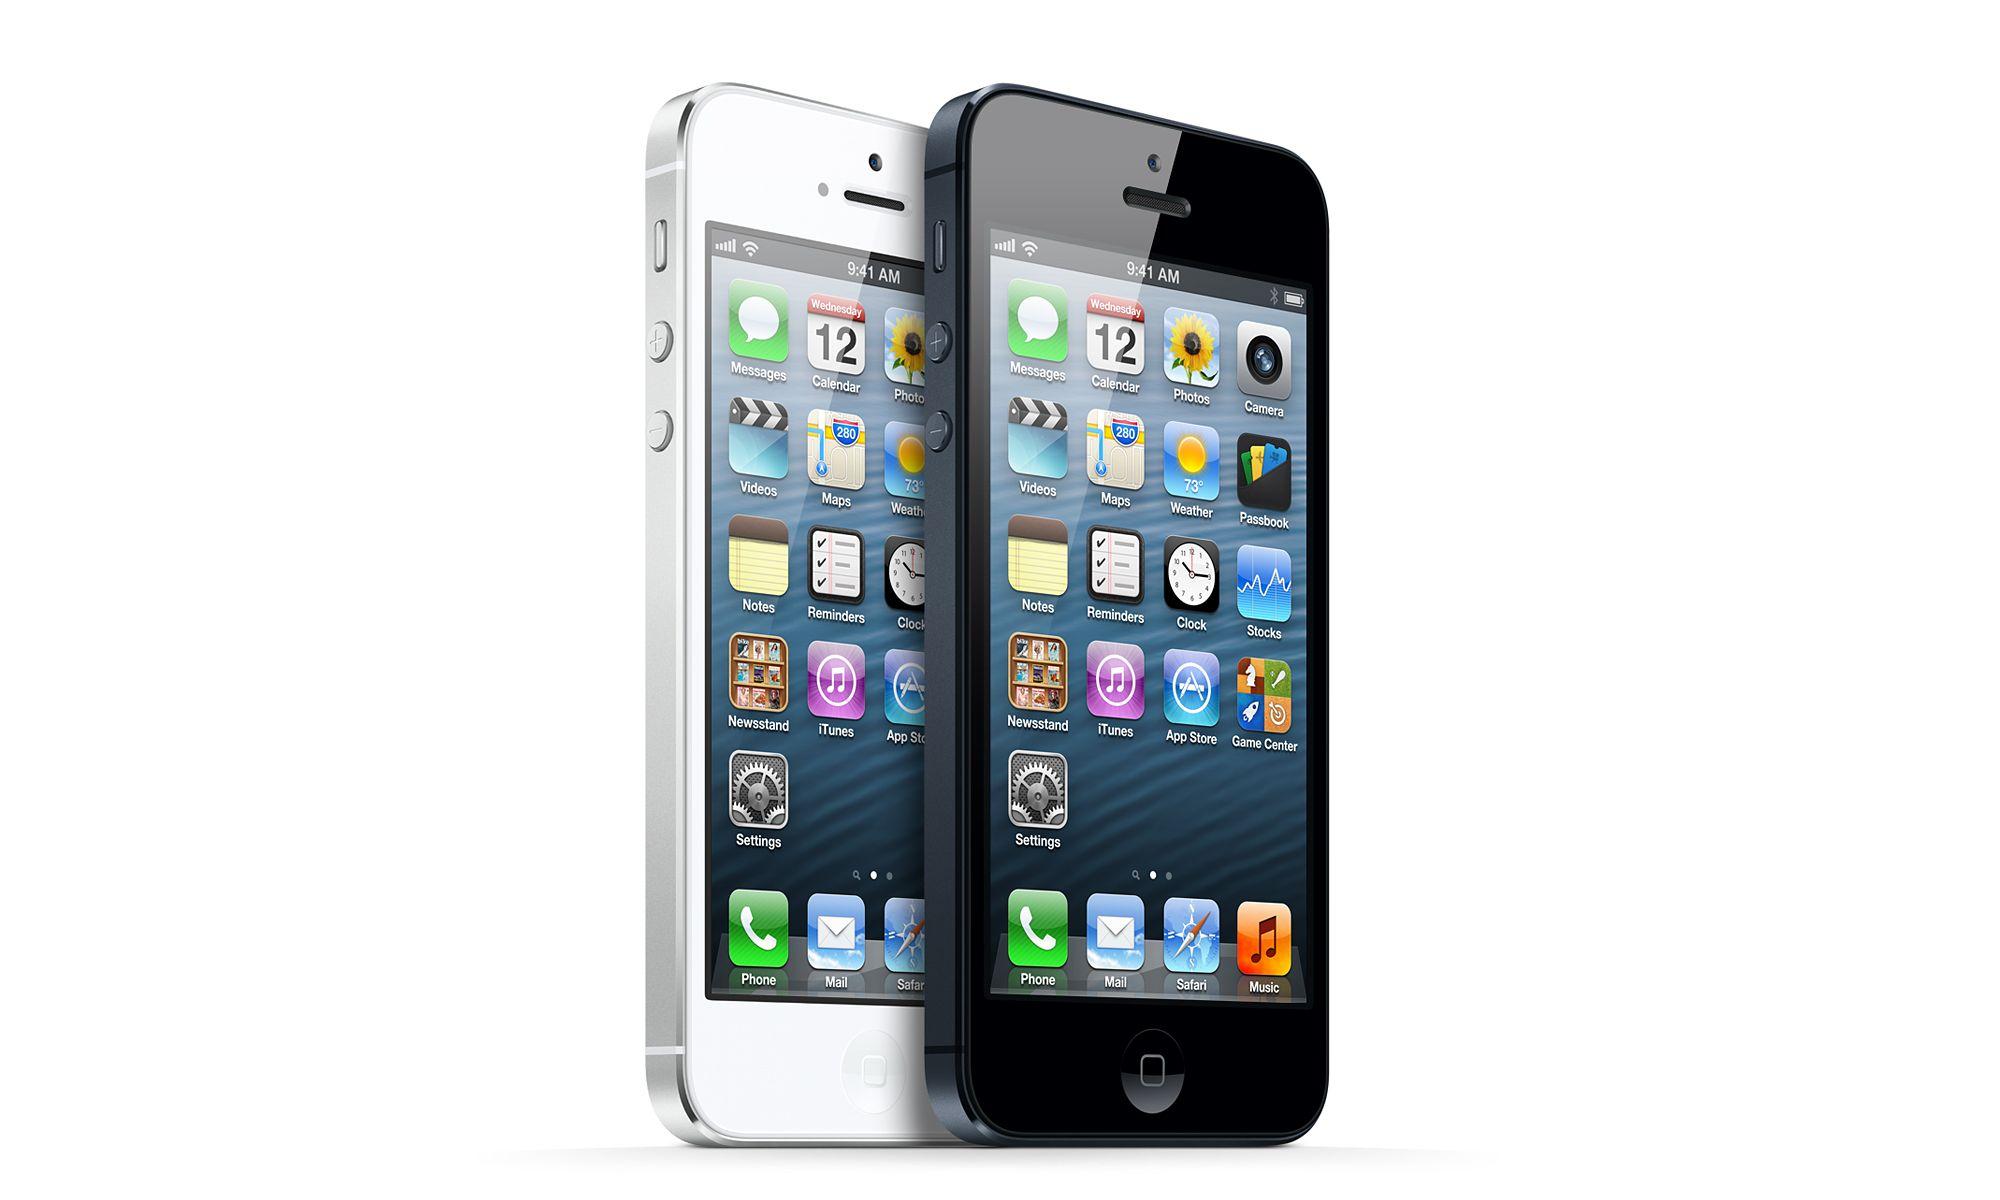 iPhone 5: calano le vendite, una voragine da 10 milioni